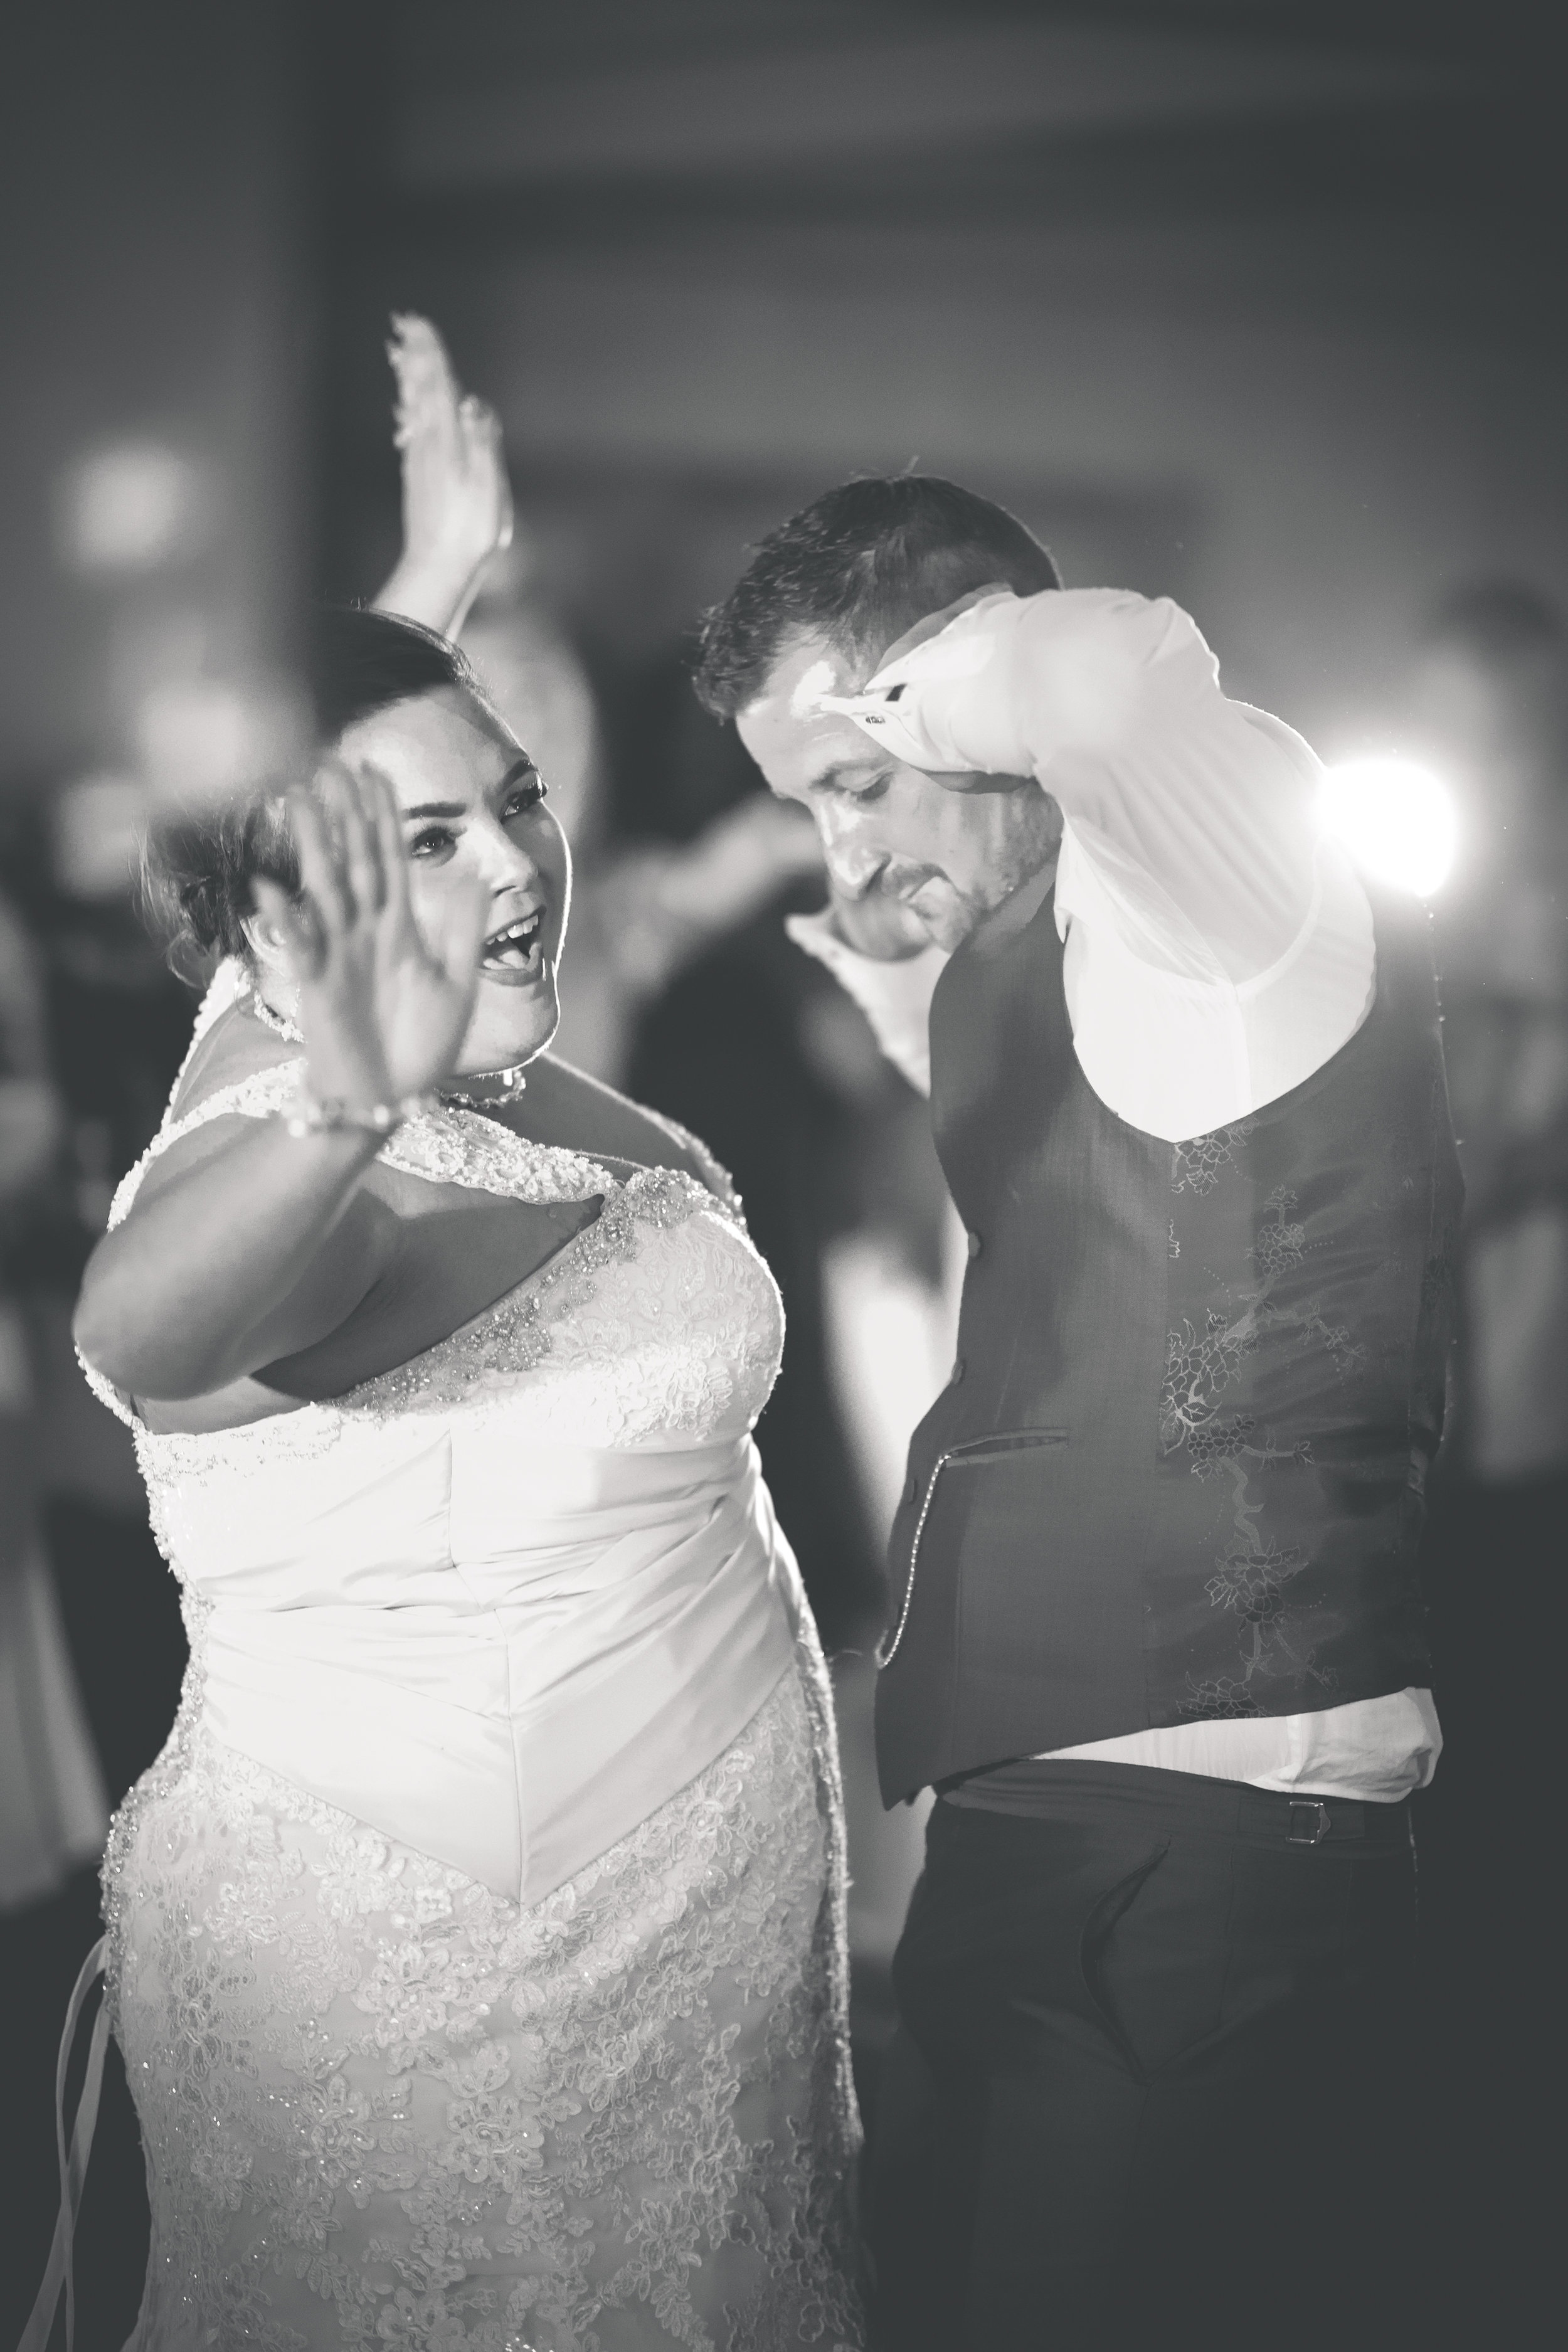 Antoinette & Stephen - First Dance | Brian McEwan Photography | Wedding Photographer Northern Ireland 28.jpg